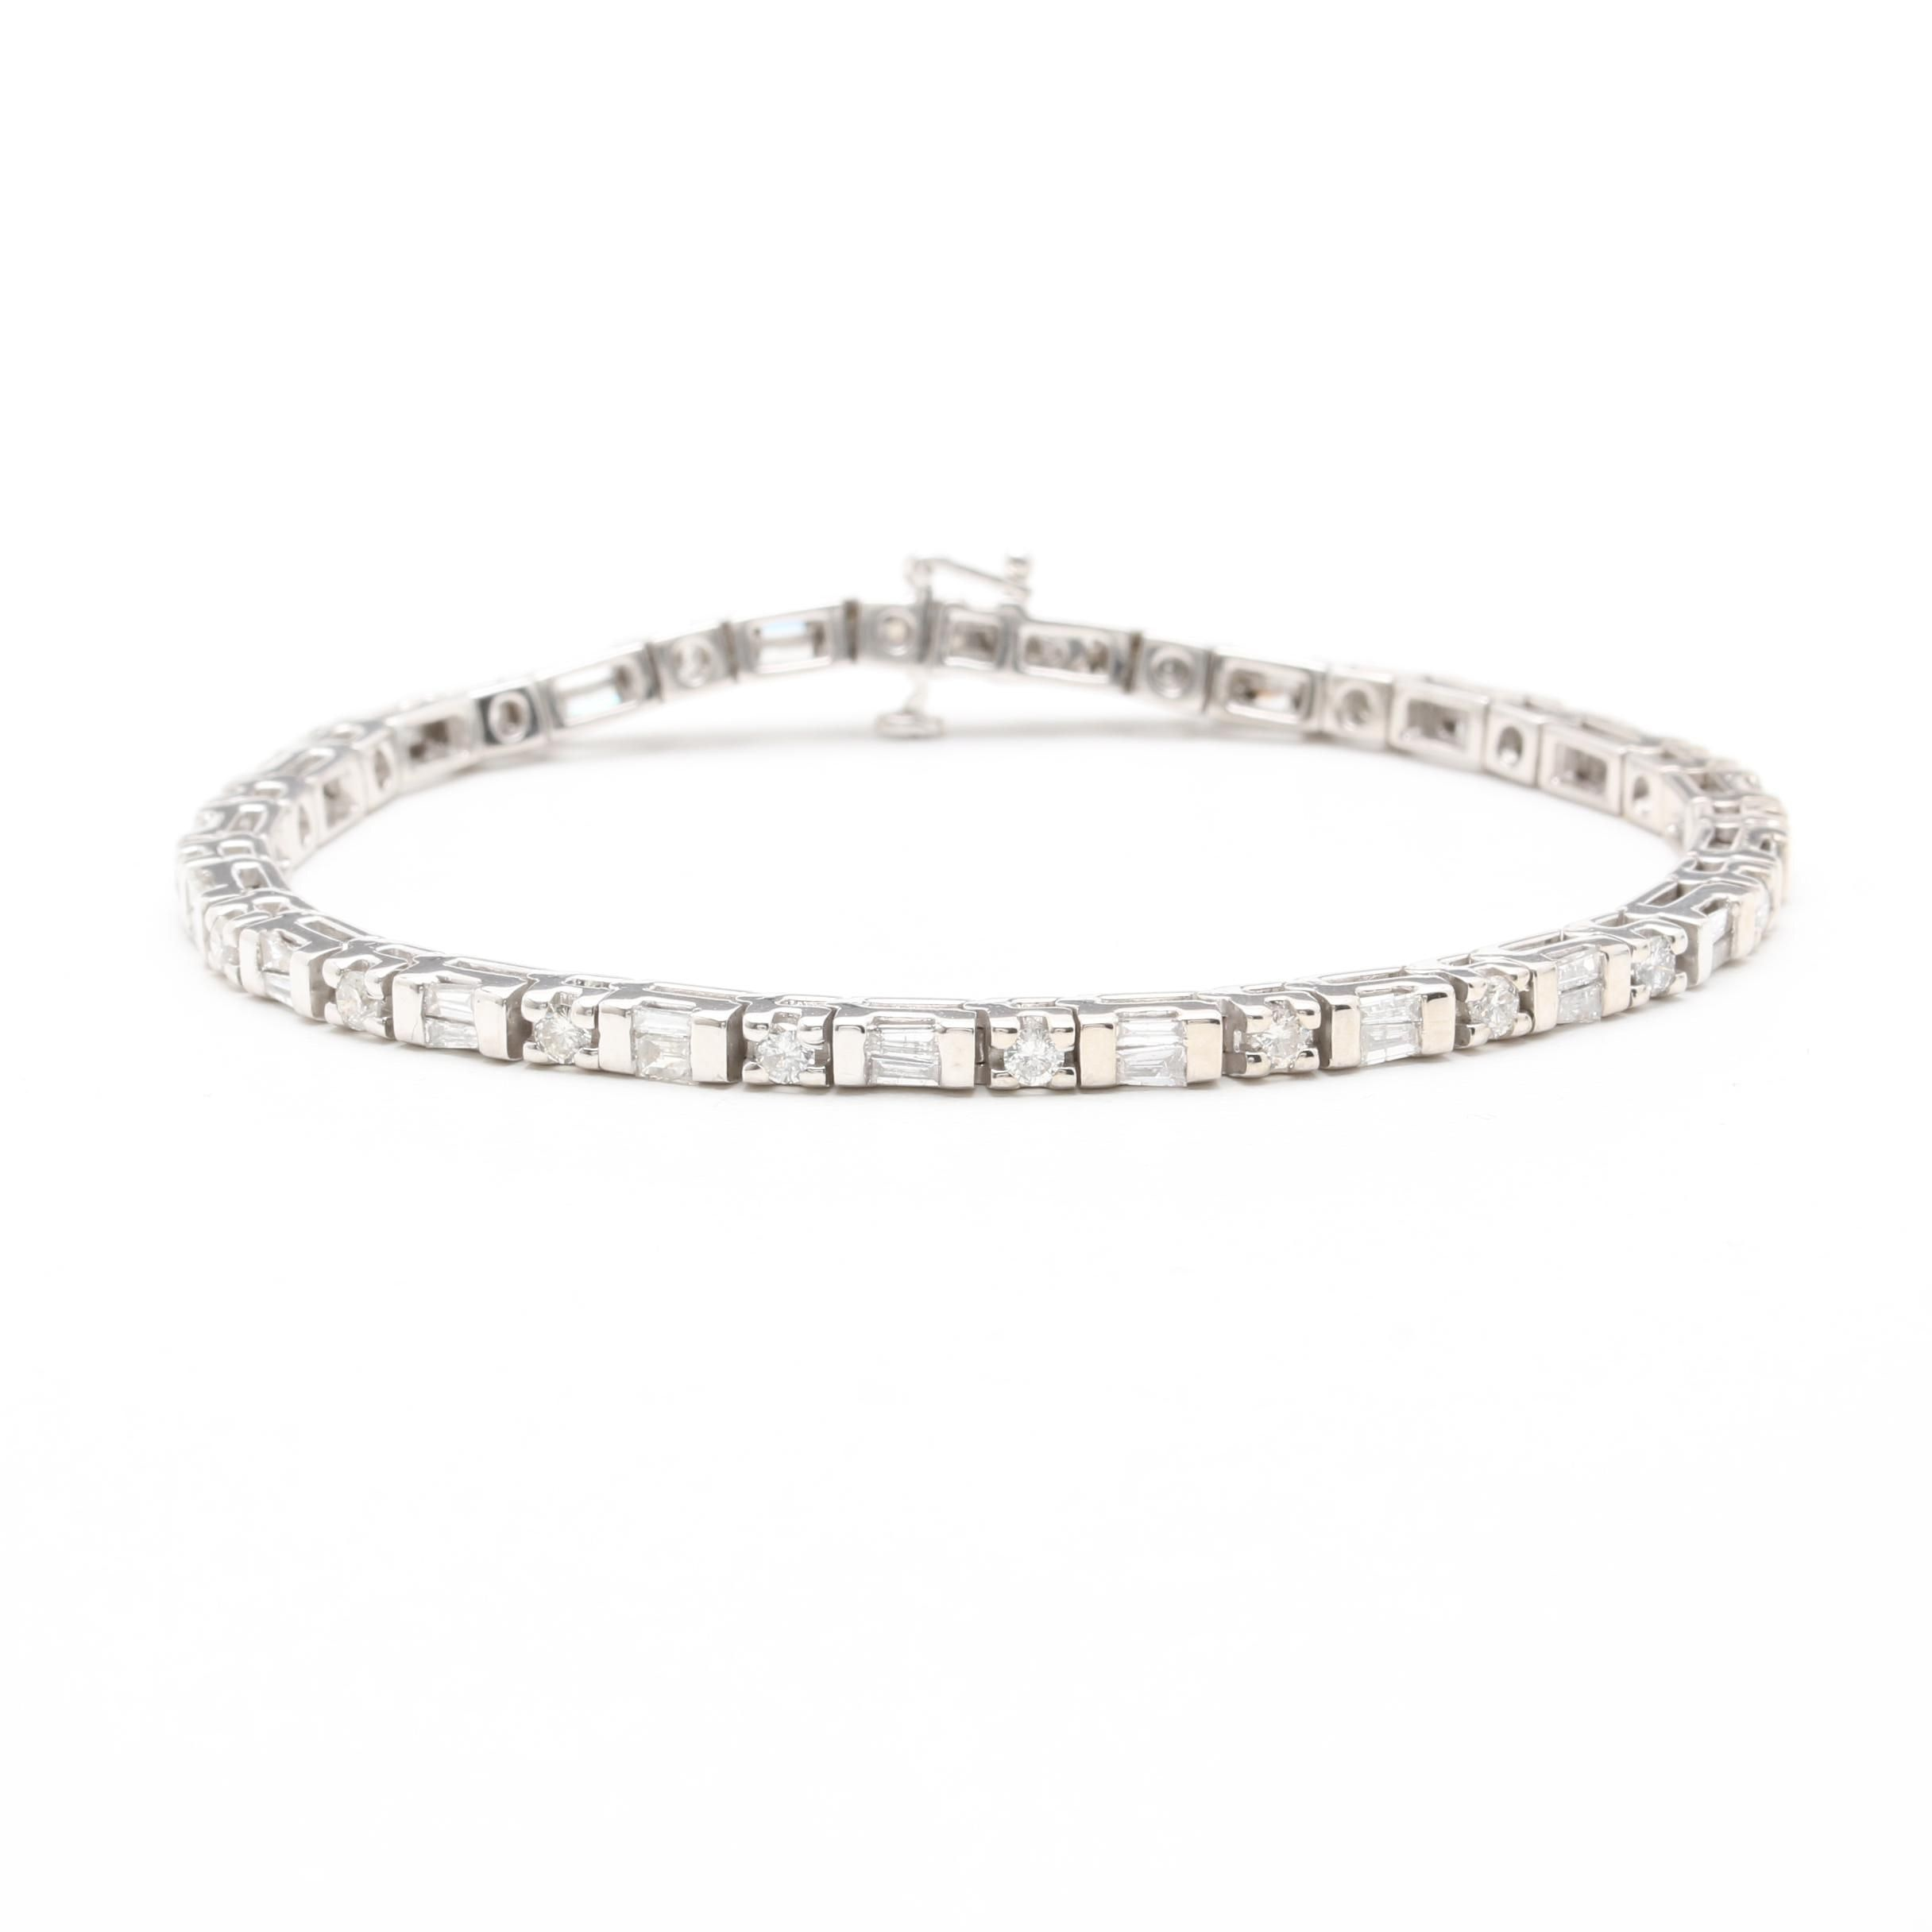 14K White Gold 2.41 CTW Diamond Tennis Bracelet